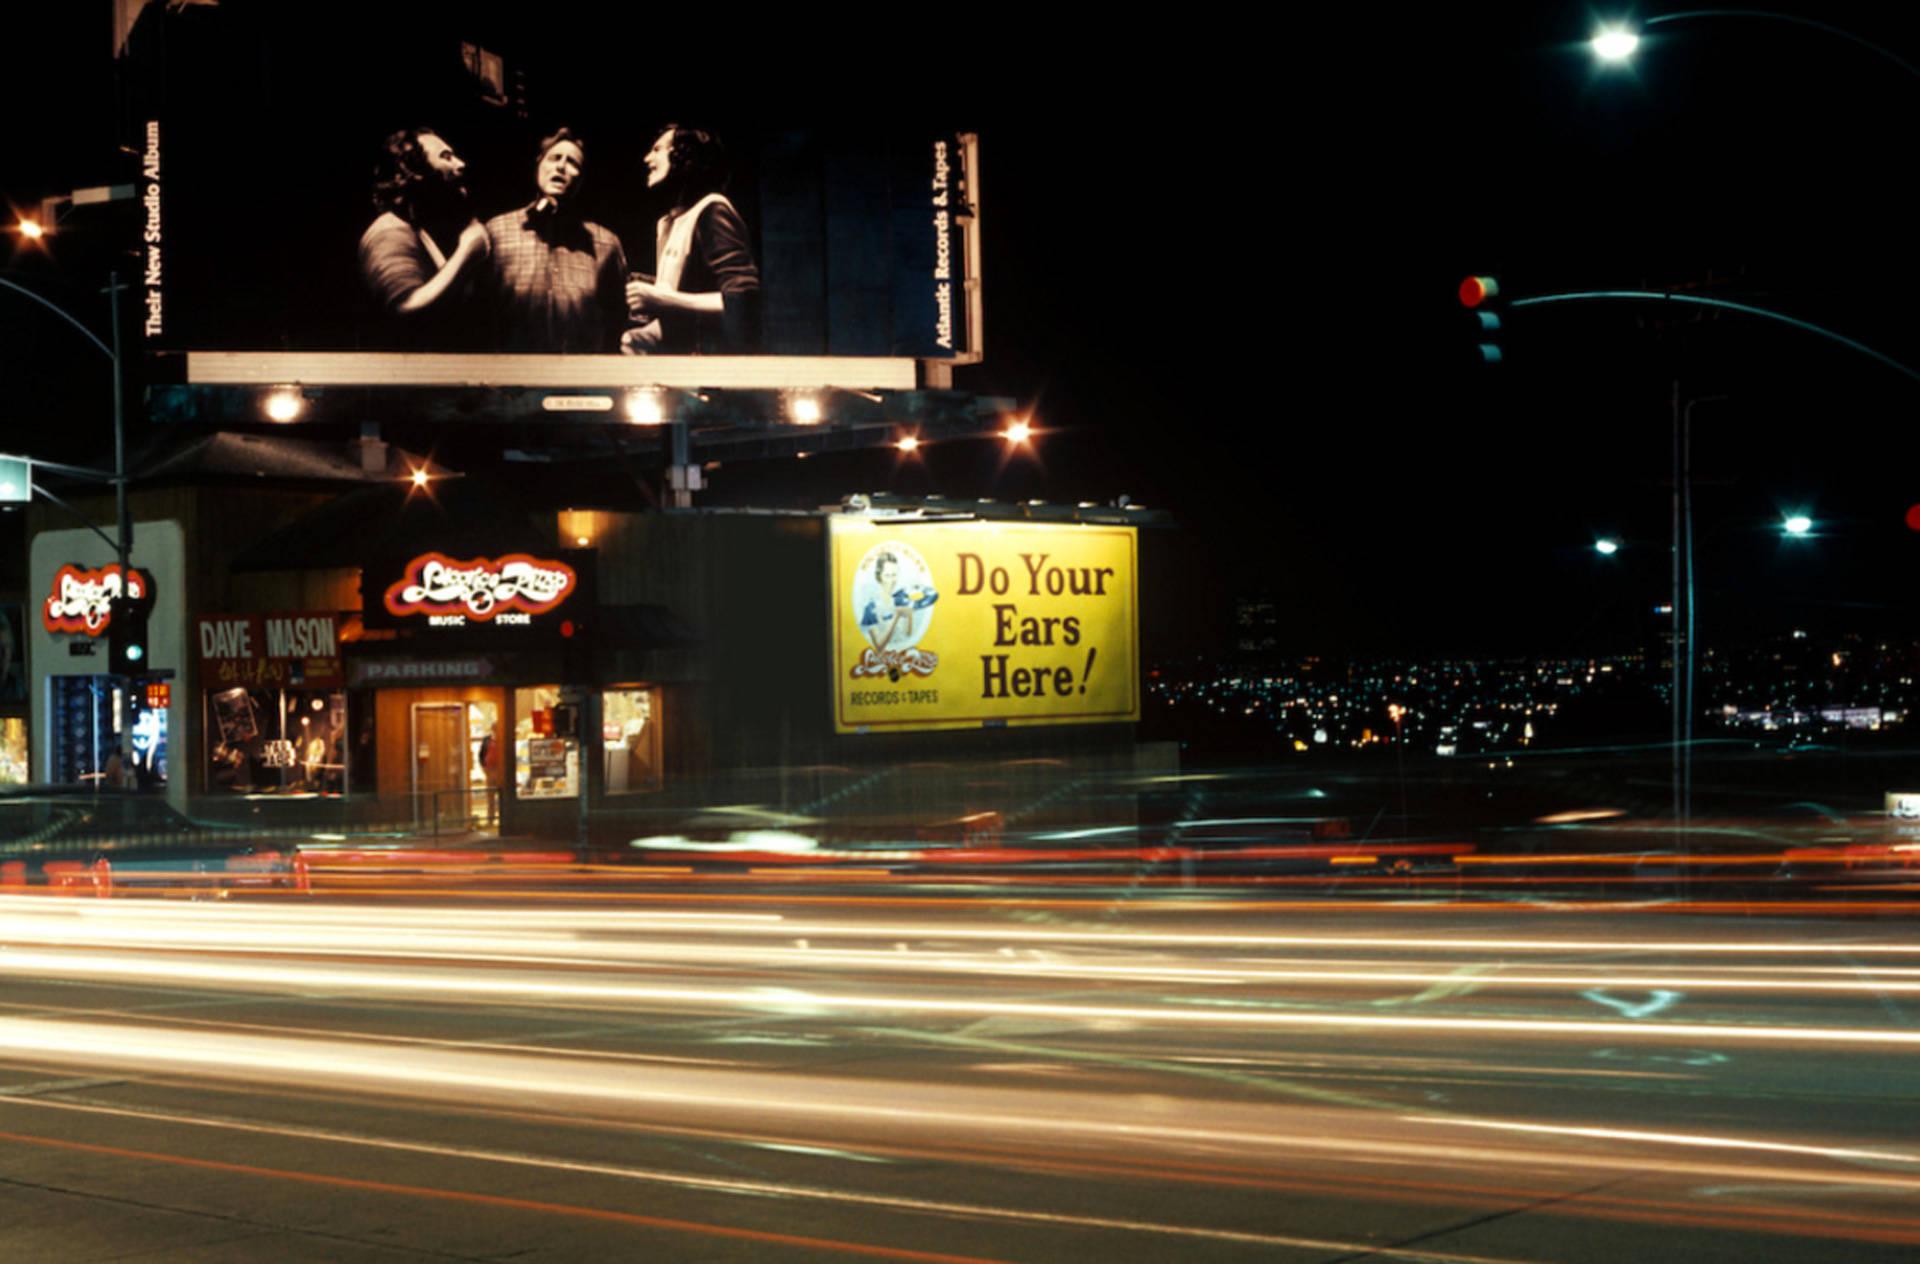 A Crosby Stills & Nash billboard on the Sunset Strip, circa 1977. Robert Landau